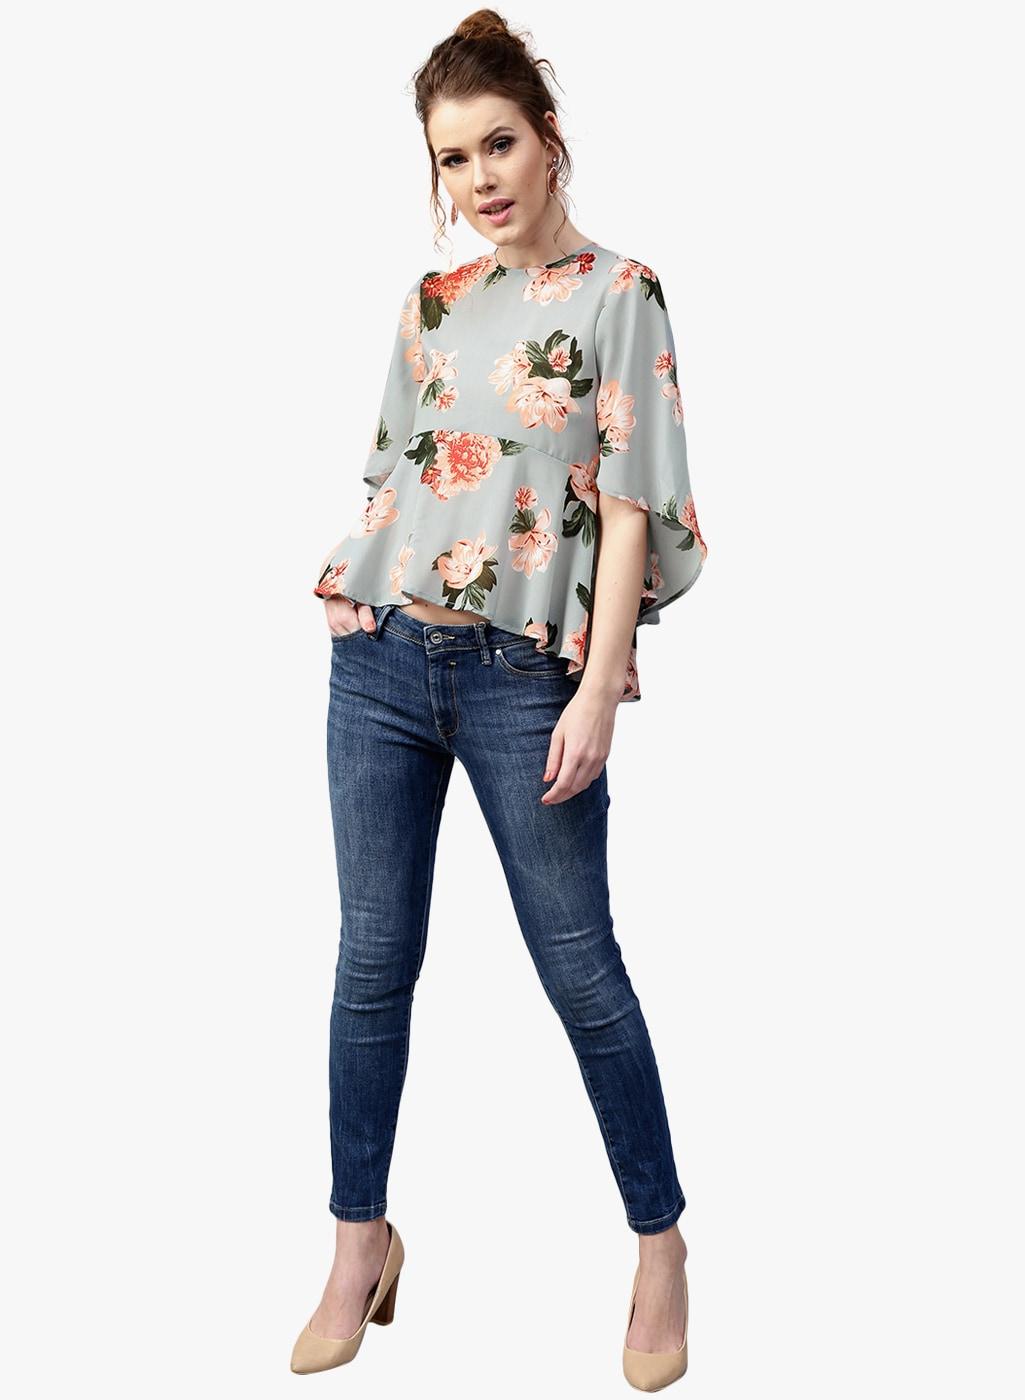 Underwear & Sleepwears 2019 Summer Homewear Couples Casual Striped Pajama Sets Male O-neck Collar Shirt & Half Pants Men Modal Cotton Sleepwear Suit Latest Fashion